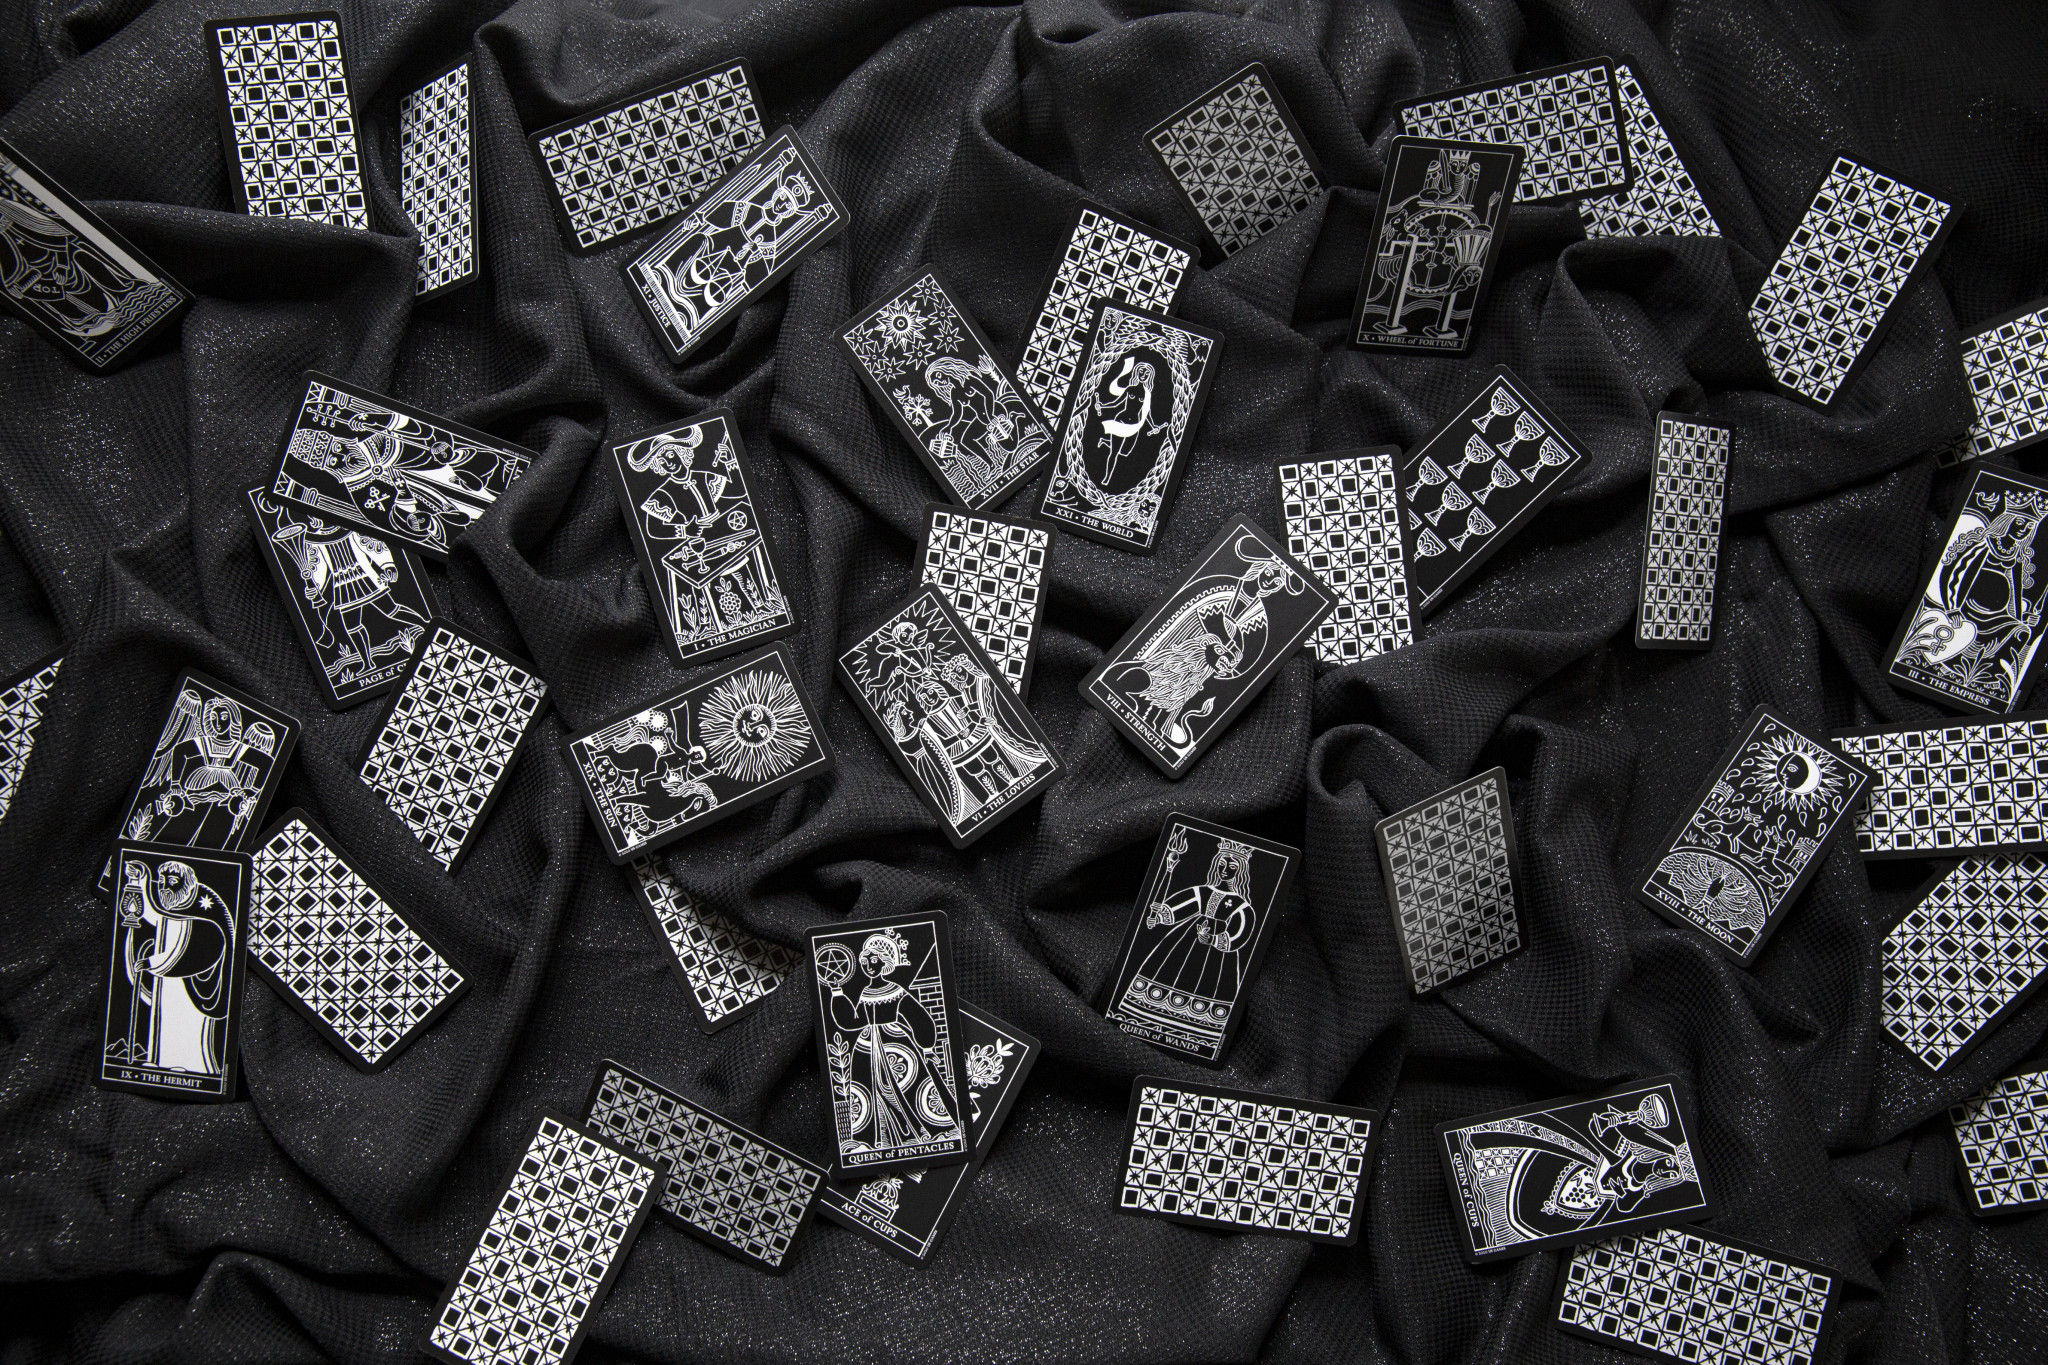 Black and white tarot cards spread across a glittery black cloth